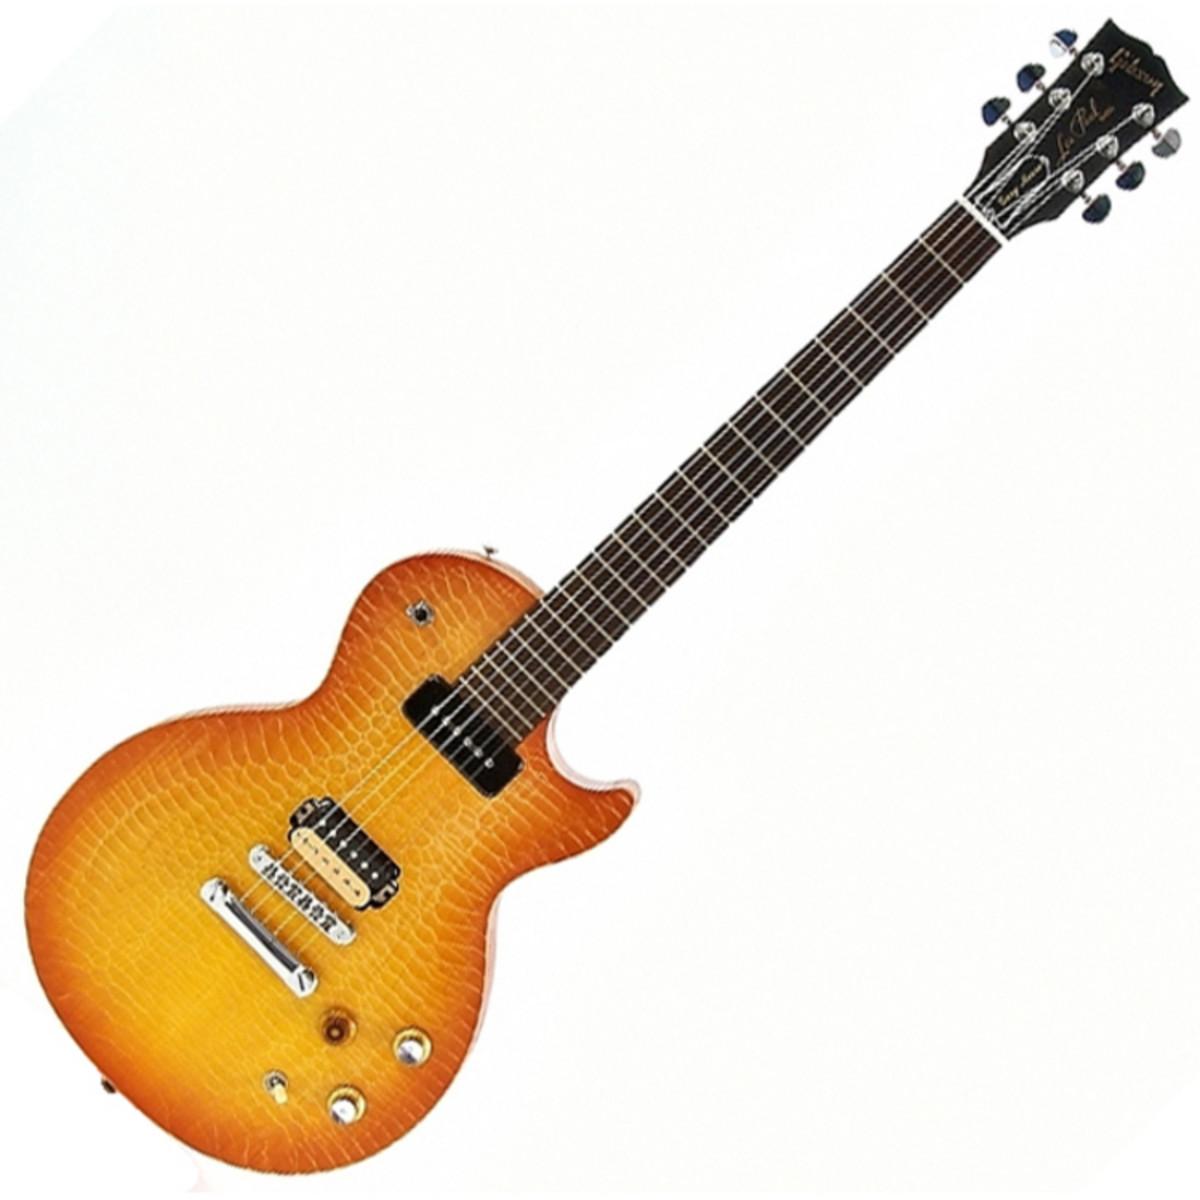 Gibson bfg gary moore signature edition guitar at - Gibson gary moore ...